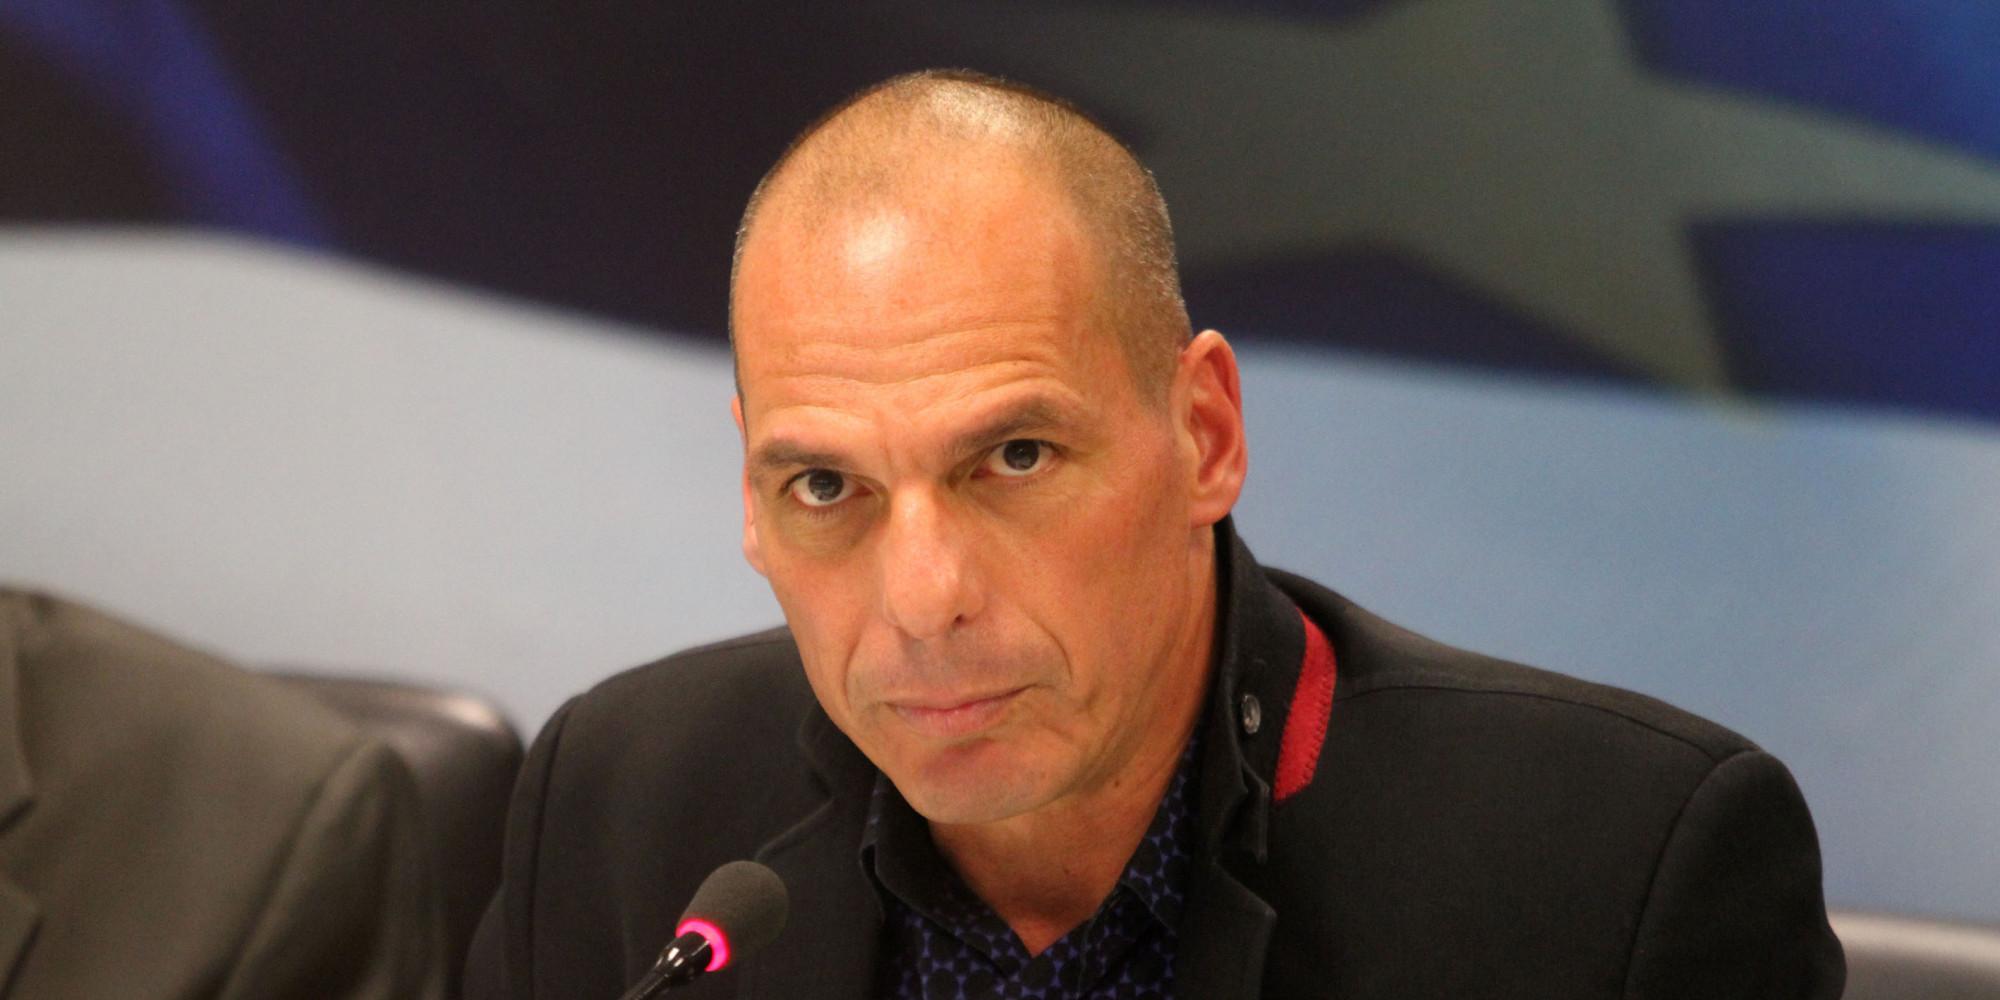 Varoufakis: Not even God can save Greece with this memorandum